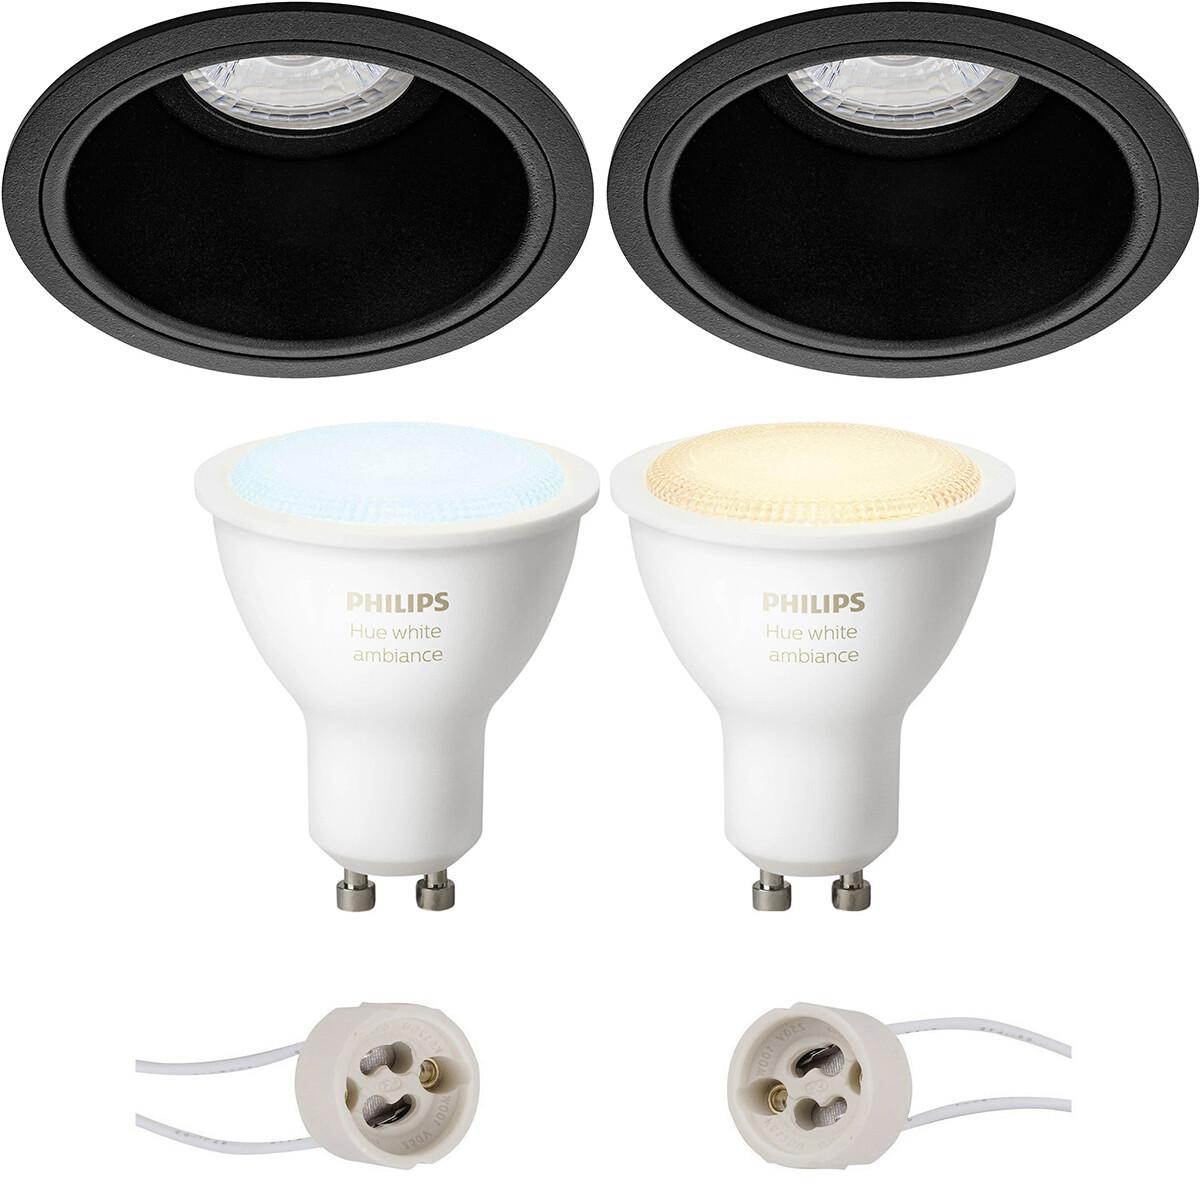 Pragmi Minko Pro - Inbouw Rond - Mat Zwart - Verdiept - Ø90mm - Philips Hue - LED Spot Set GU10 - Wh